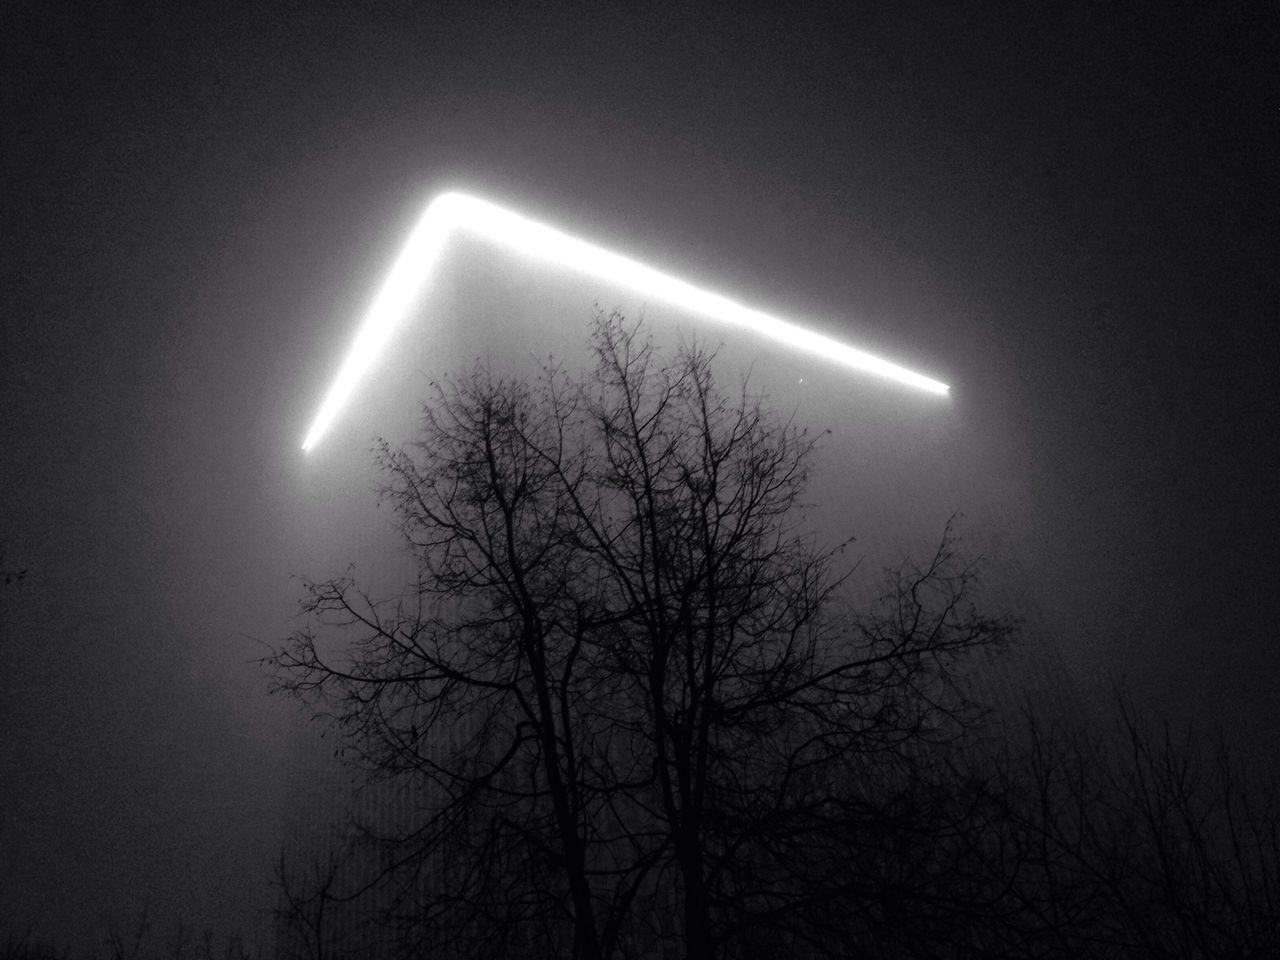 night, low angle view, no people, bare tree, illuminated